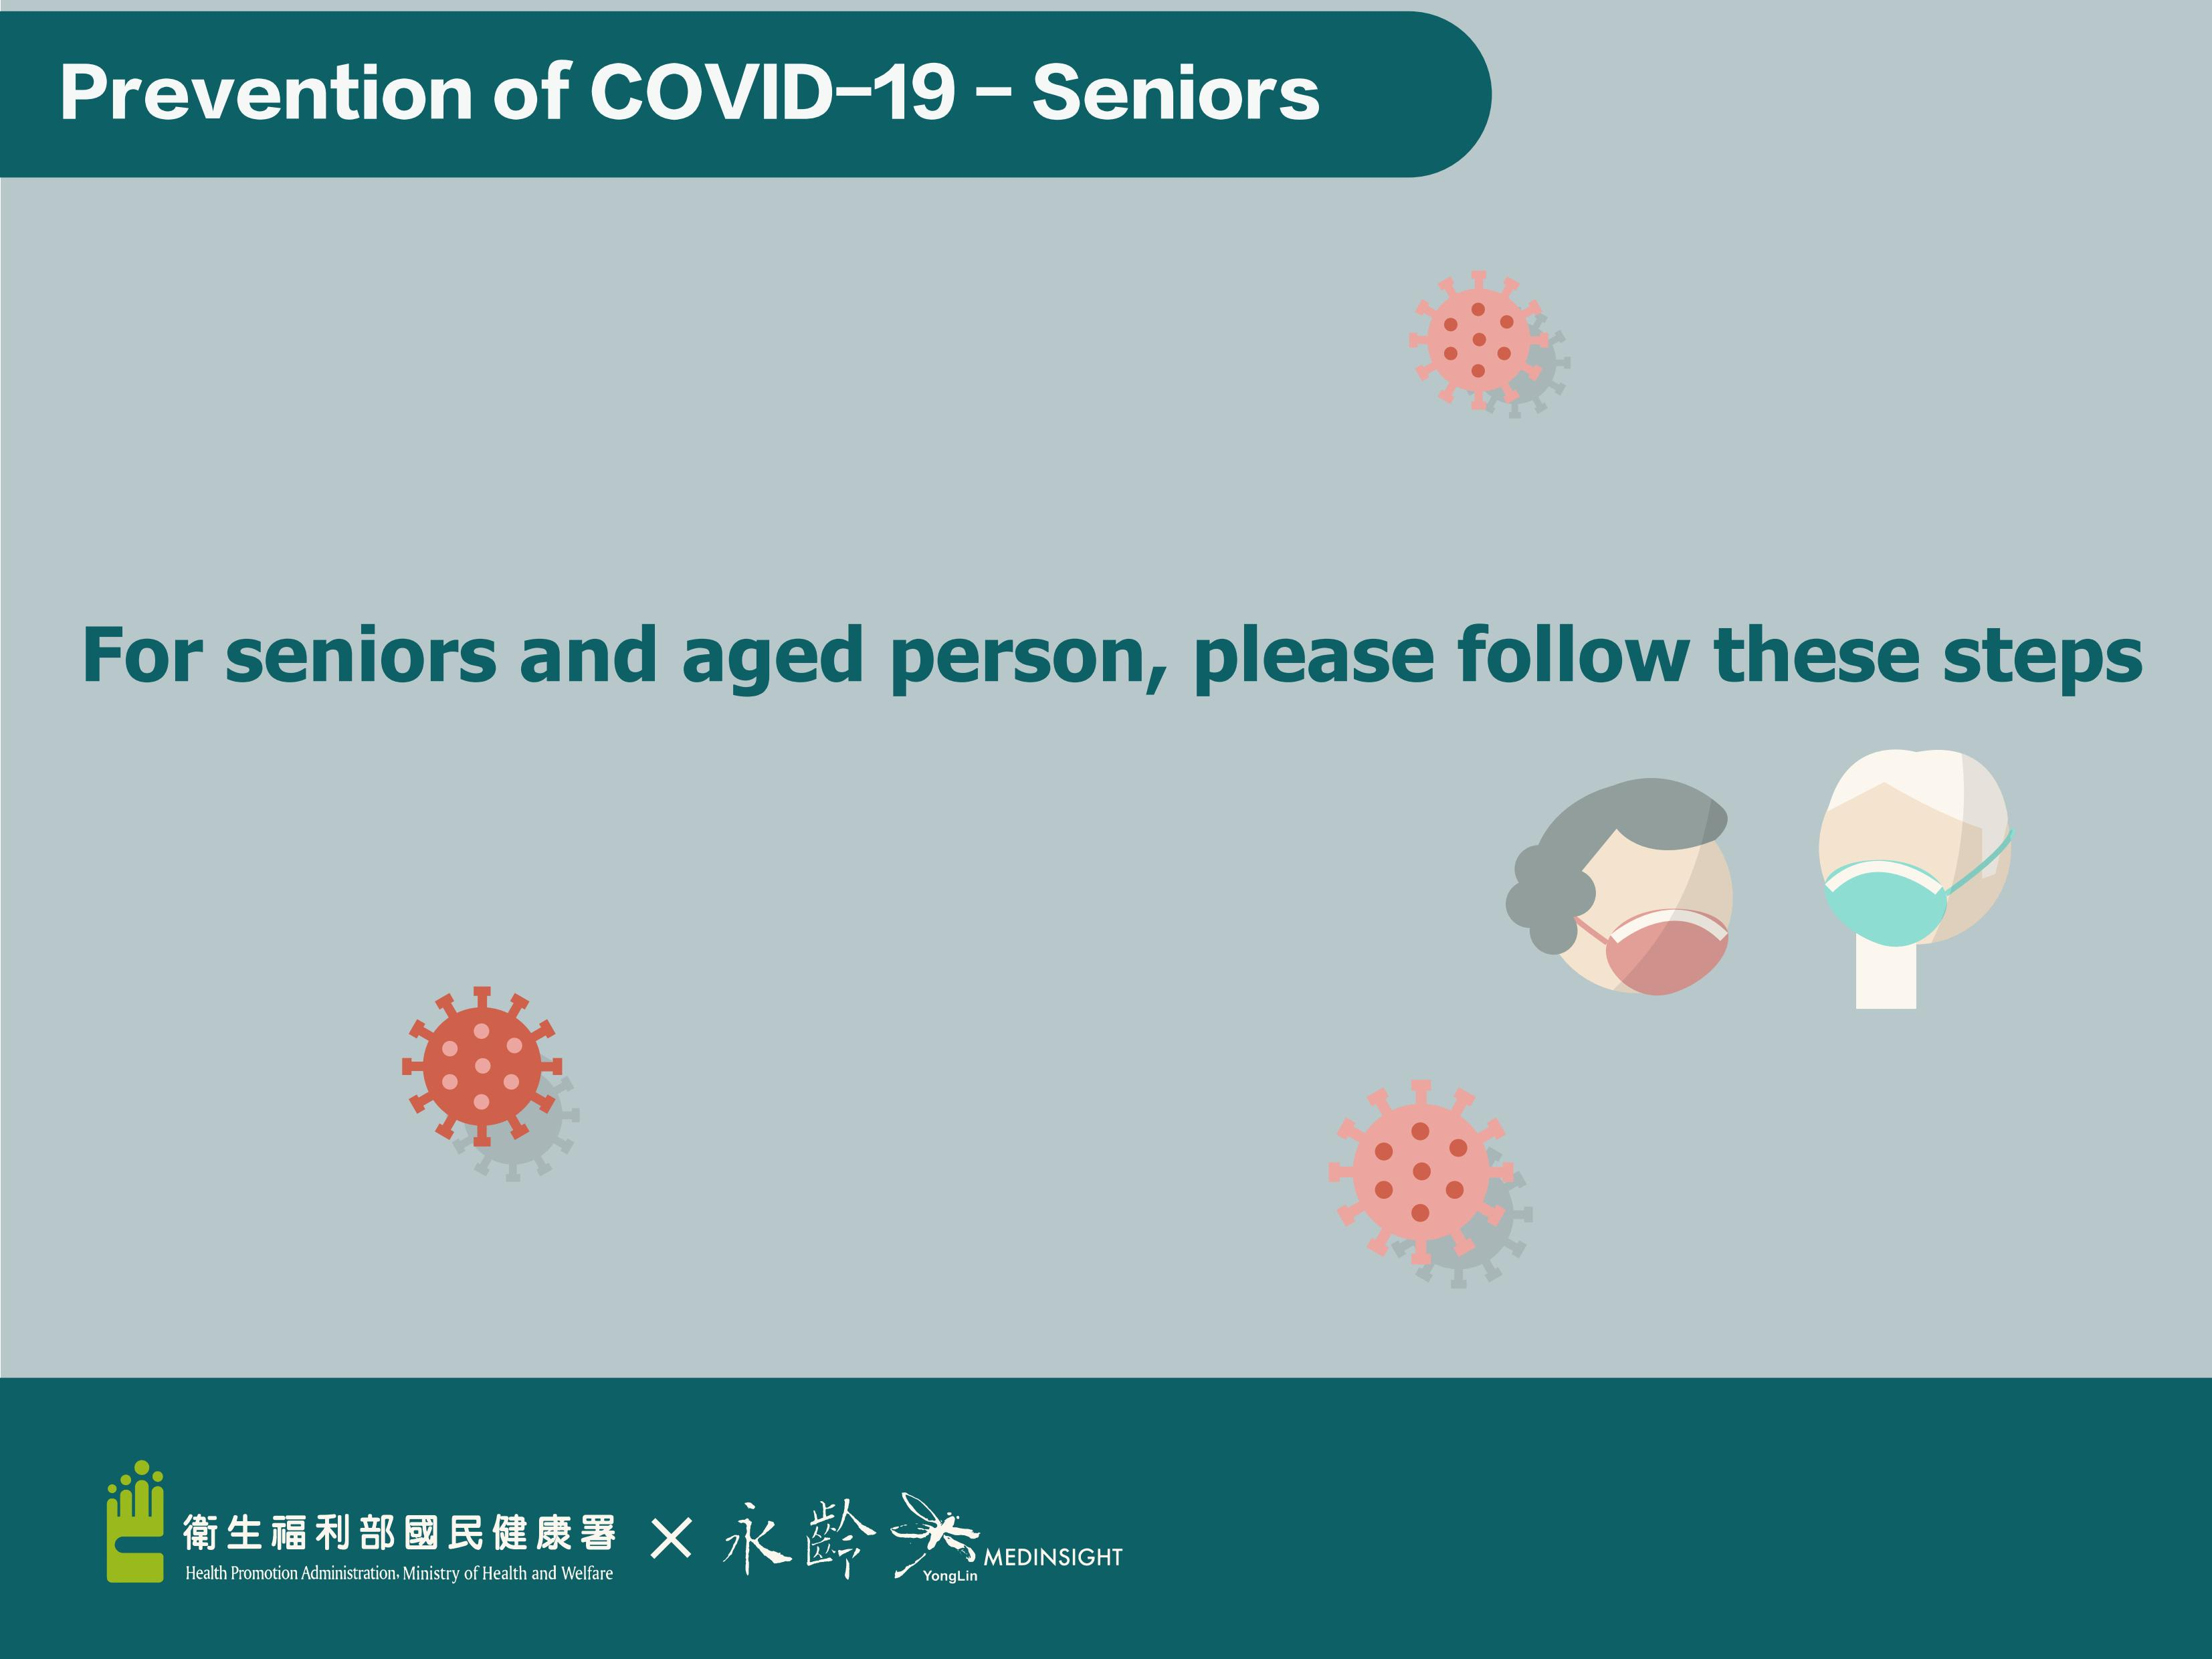 Prevention of COVID-19 - Seniors (English)